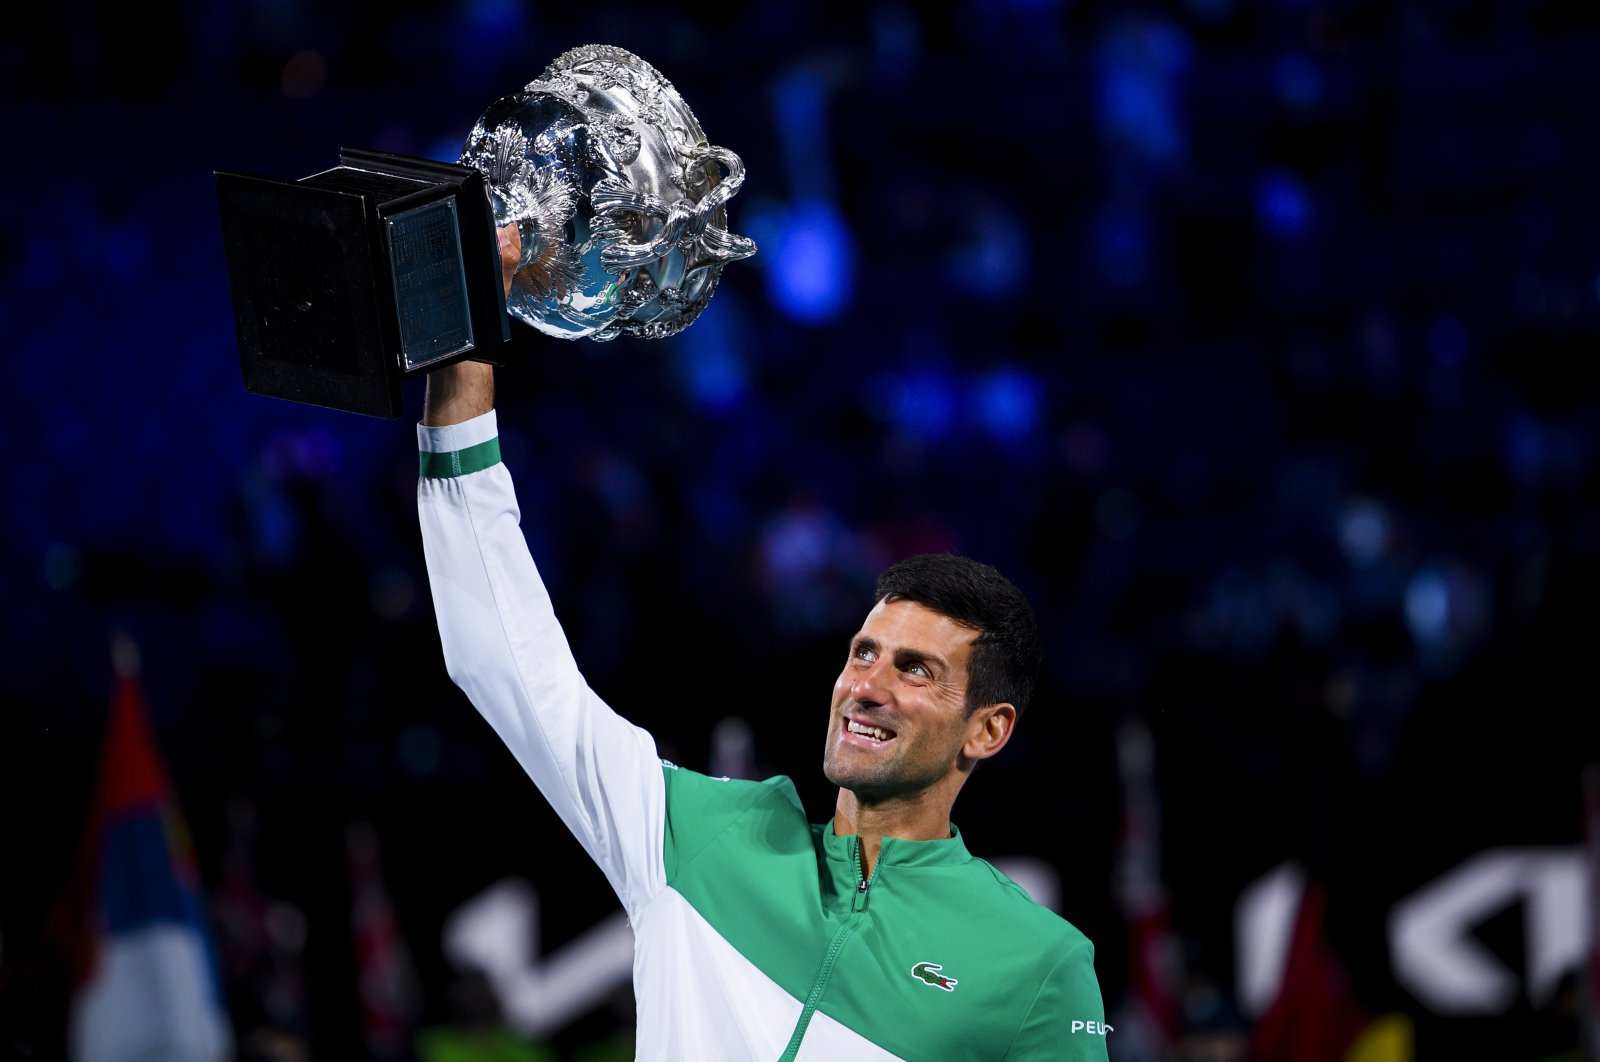 Serbia's Novak Djokovic lifts the trophy after winning the Australian Open men's singles finals against Russia's Daniil Medvedev at Melbourne Park, Melbourne, Australia, Feb. 21, 2021.  (EPA Photo)